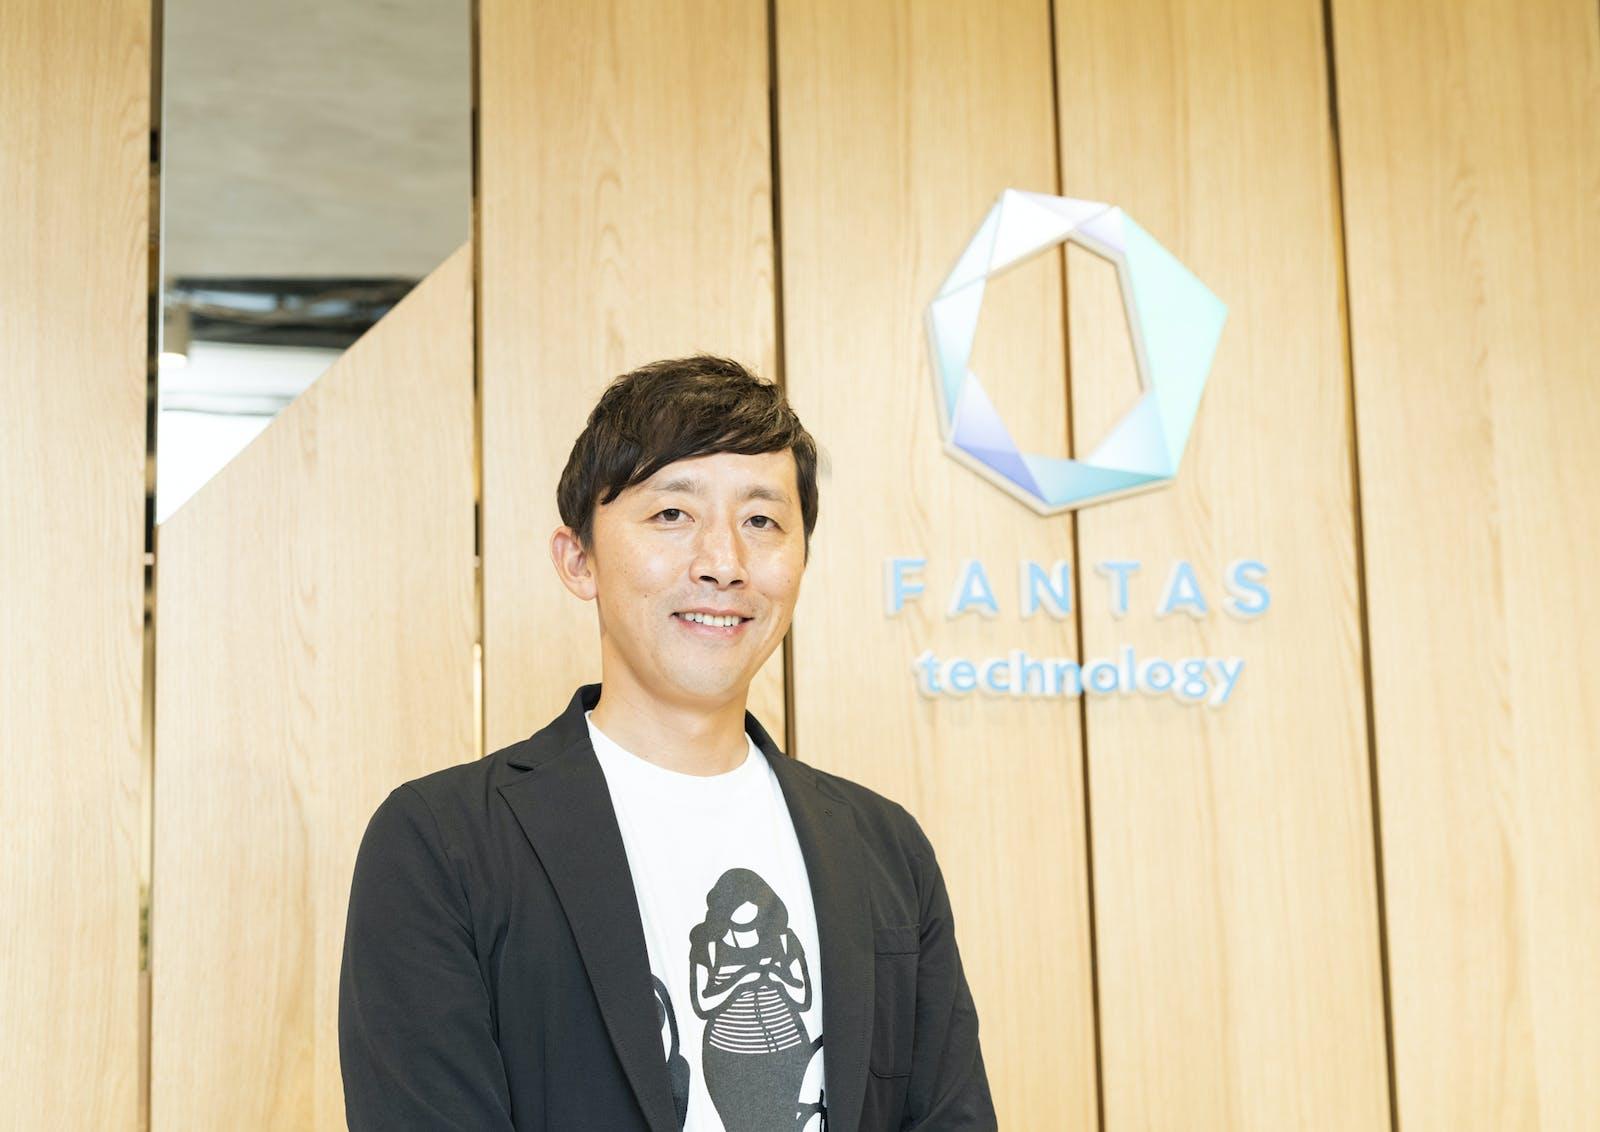 FANTAS technology 株式会社のアイキャッチ画像